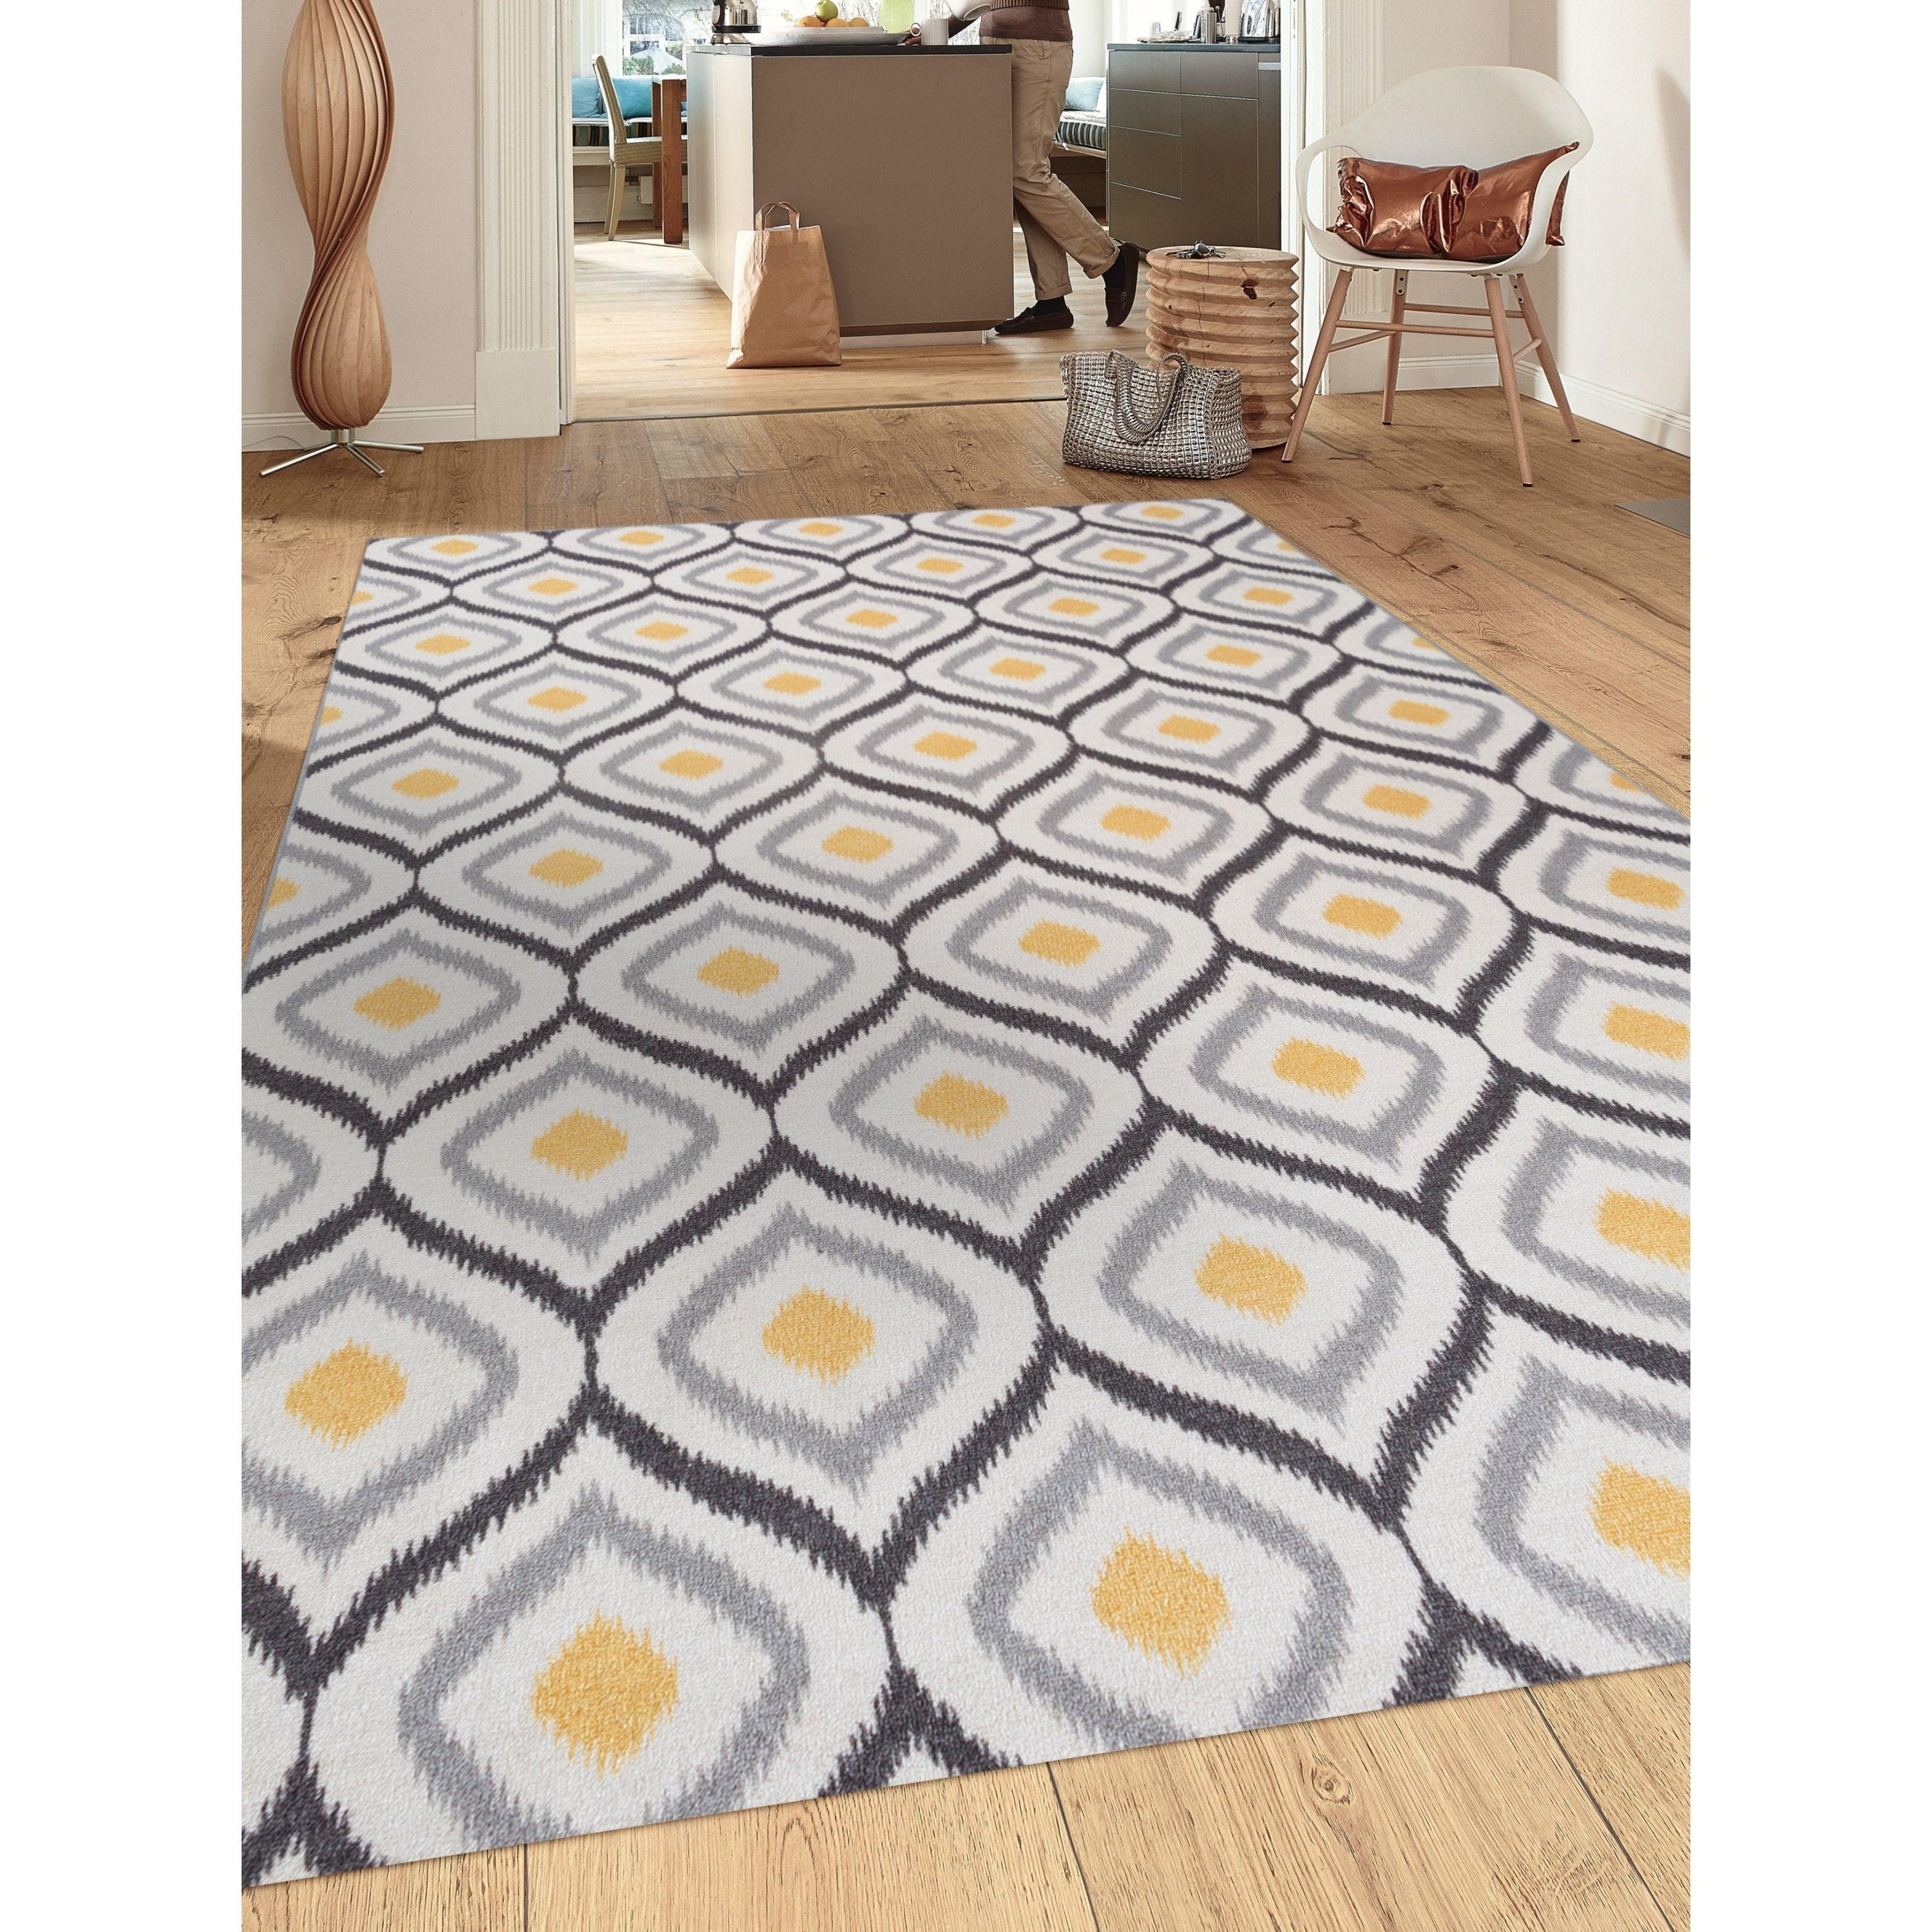 Modern Moroccan Design Non Slip Non Skid Area Rug Gray Yellow 7